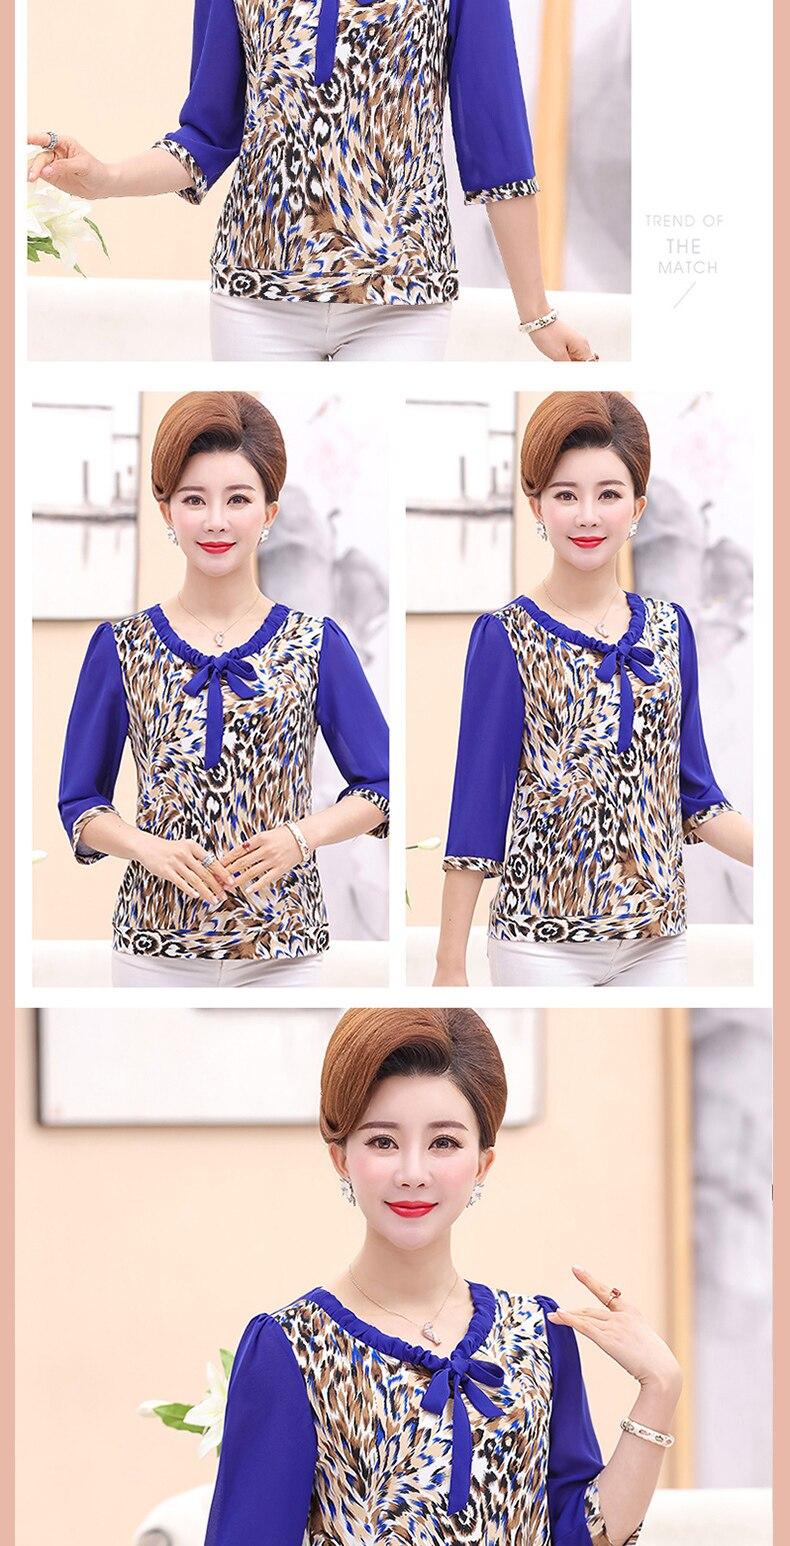 Women Summer Blouses Khaki Blue Leopard Print Crepe Tops Female Short Sleeve Bowknot Round Collar Tunic Woman Casual Blouse Shirt (10)